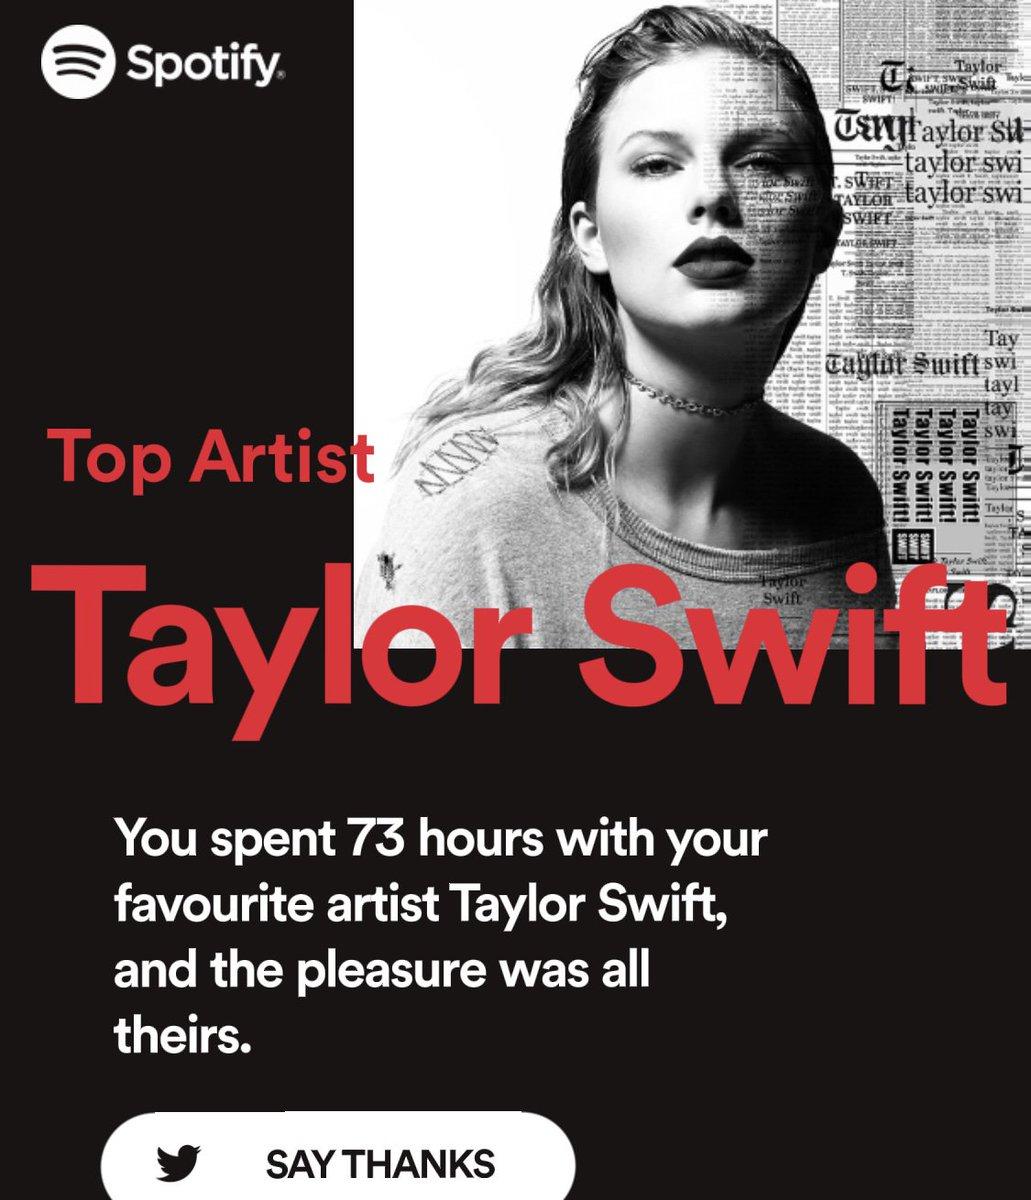 RT @574657938: #SpotifyWrapped2018  #Spotify2018 #TaylorSwift #reputation https://t.co/UeMLTTIlws